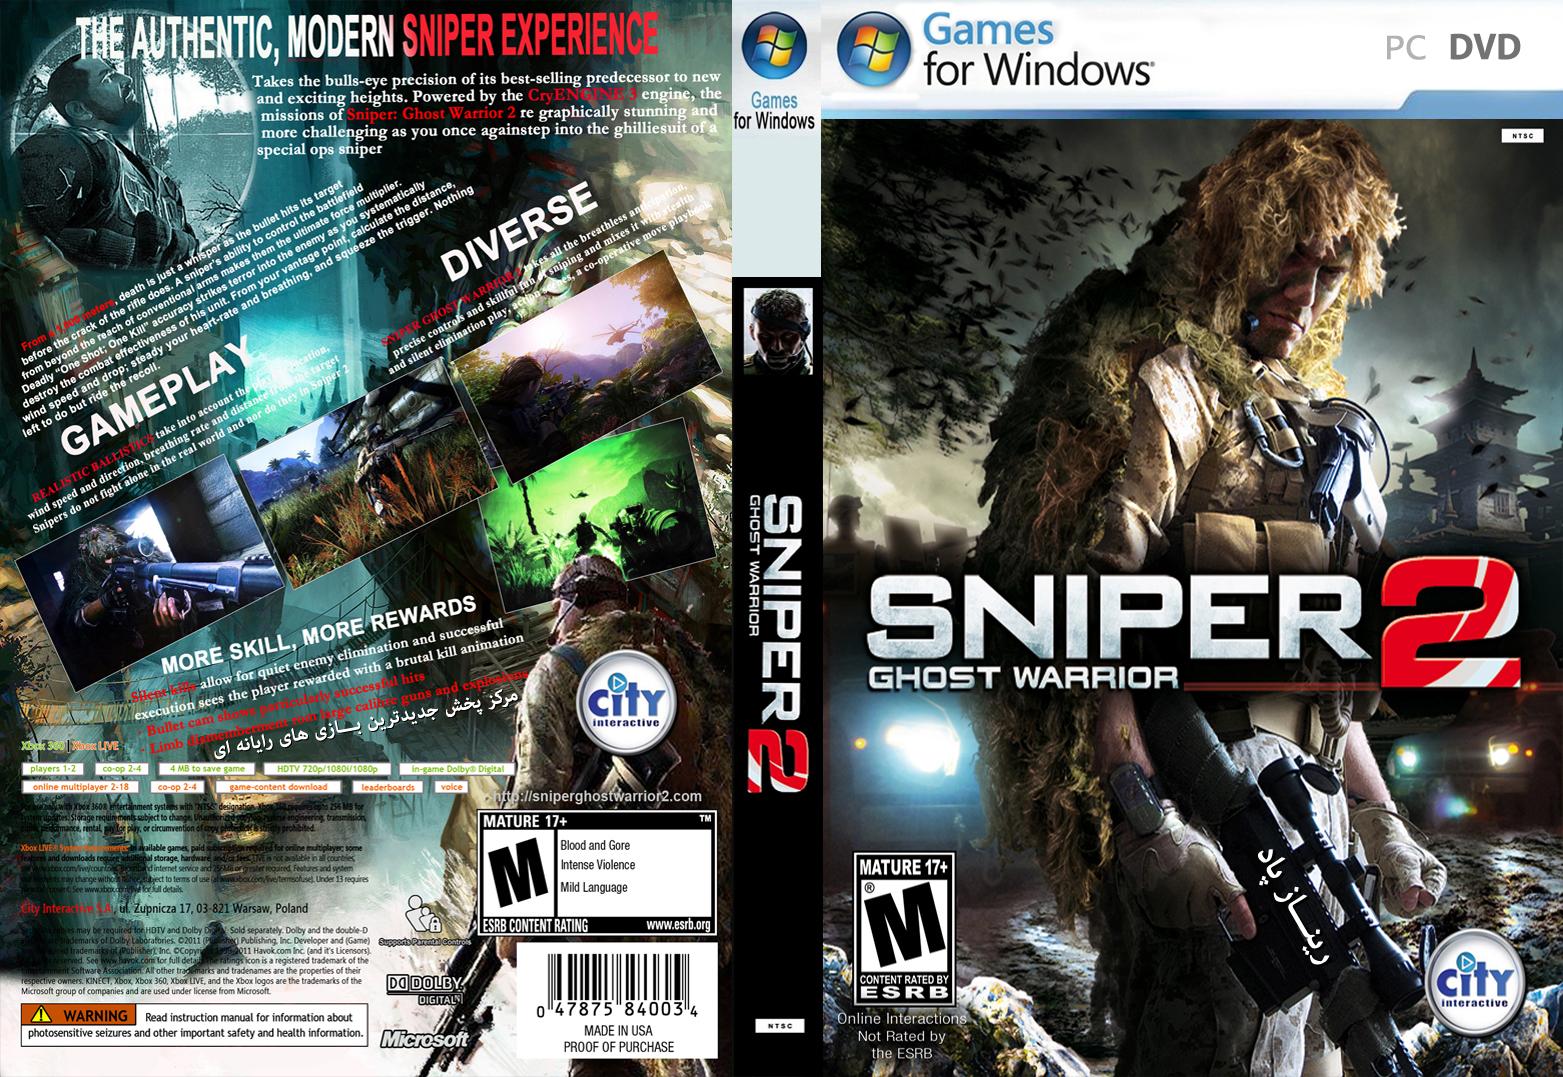 Sniper Ghost Warrior Debugconf.Scr File